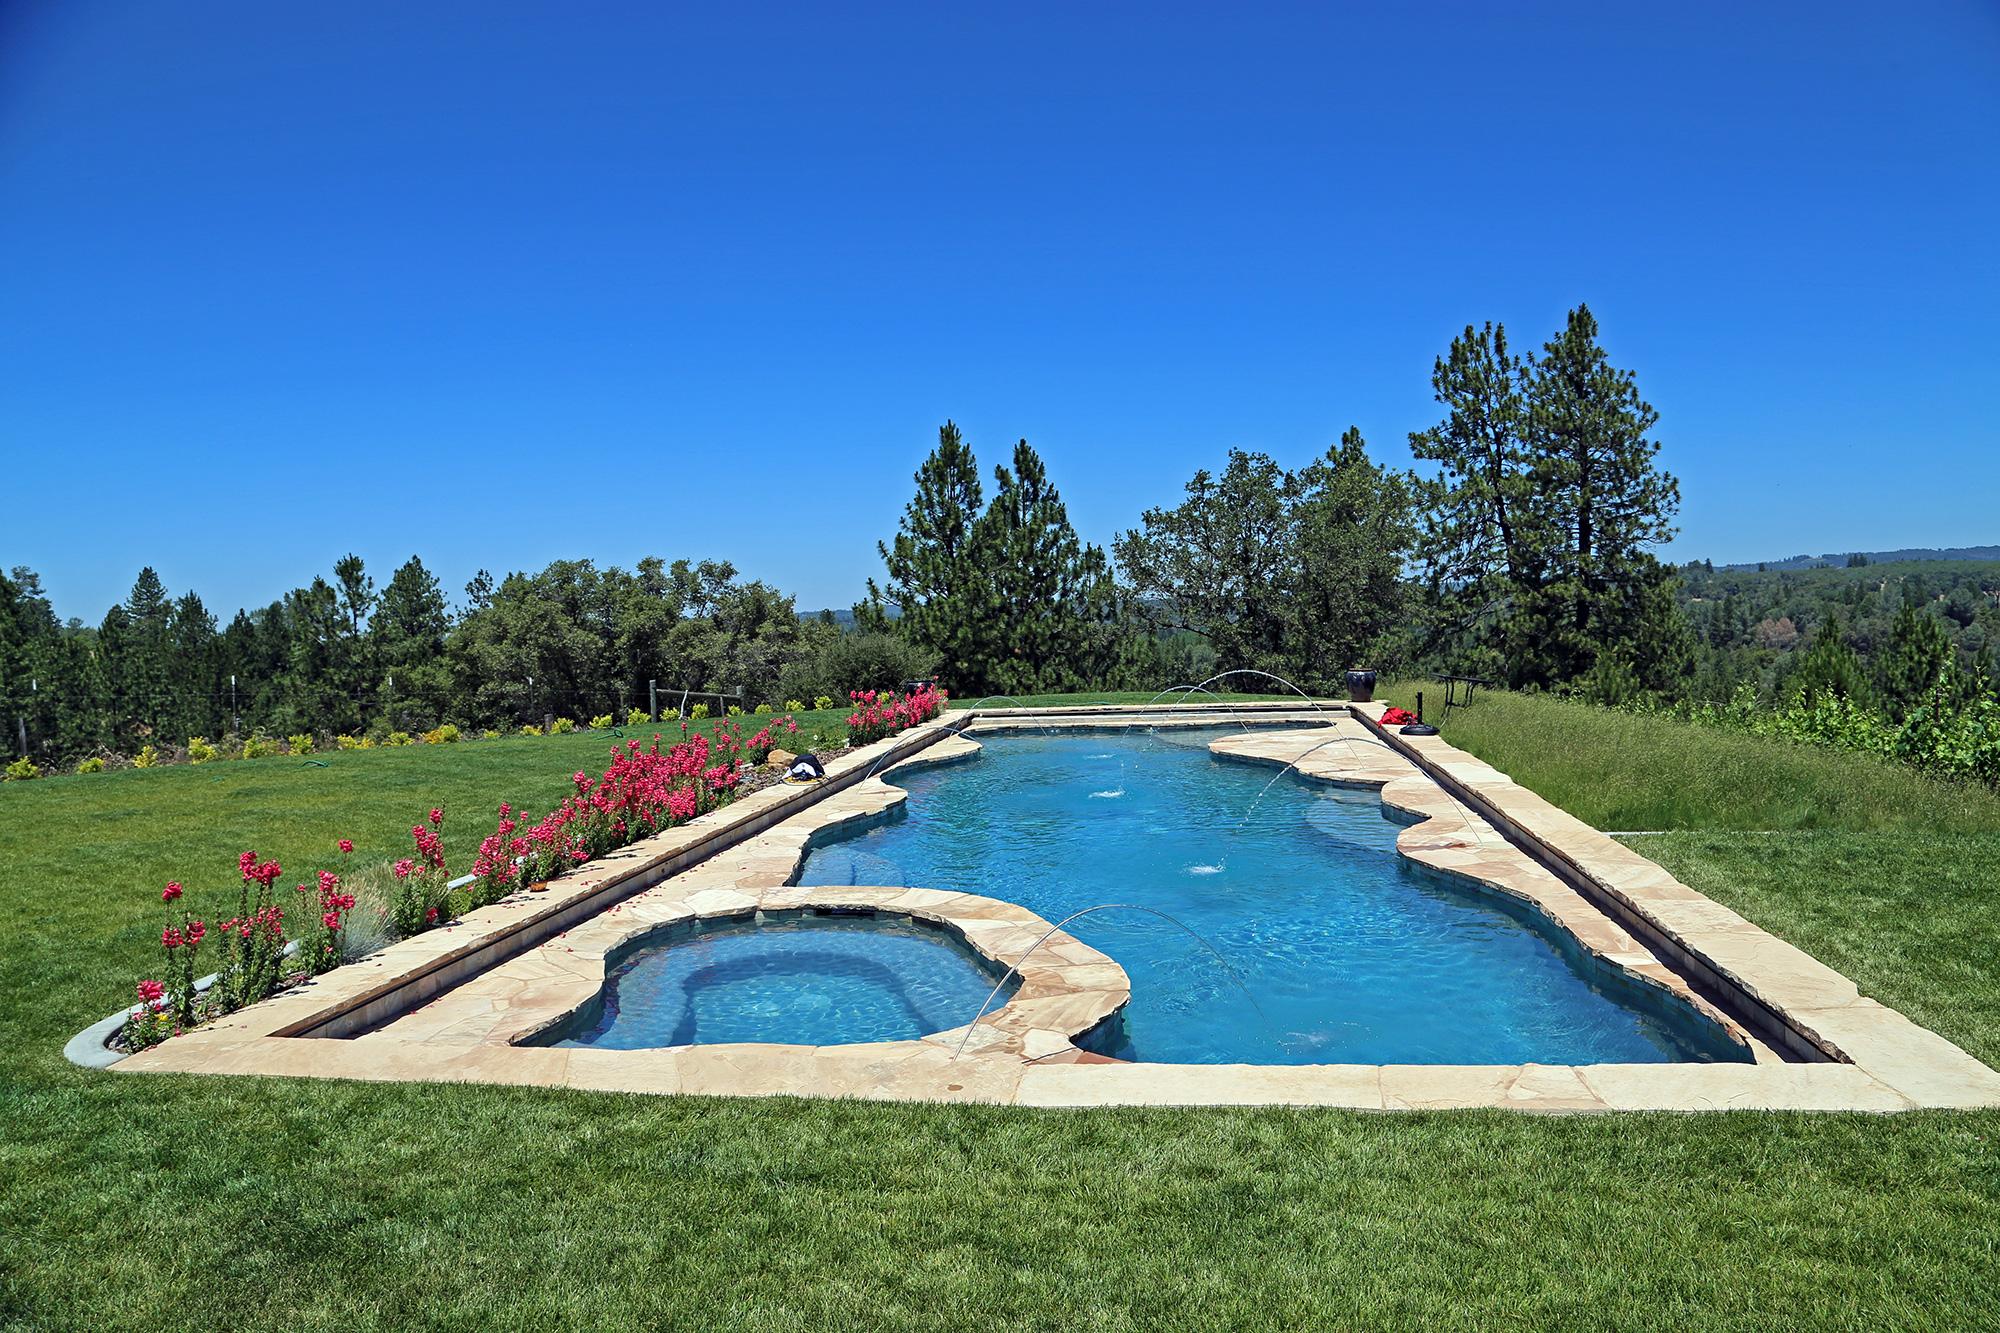 Heated swimming pool with vineyard views in the Sierra Foothills